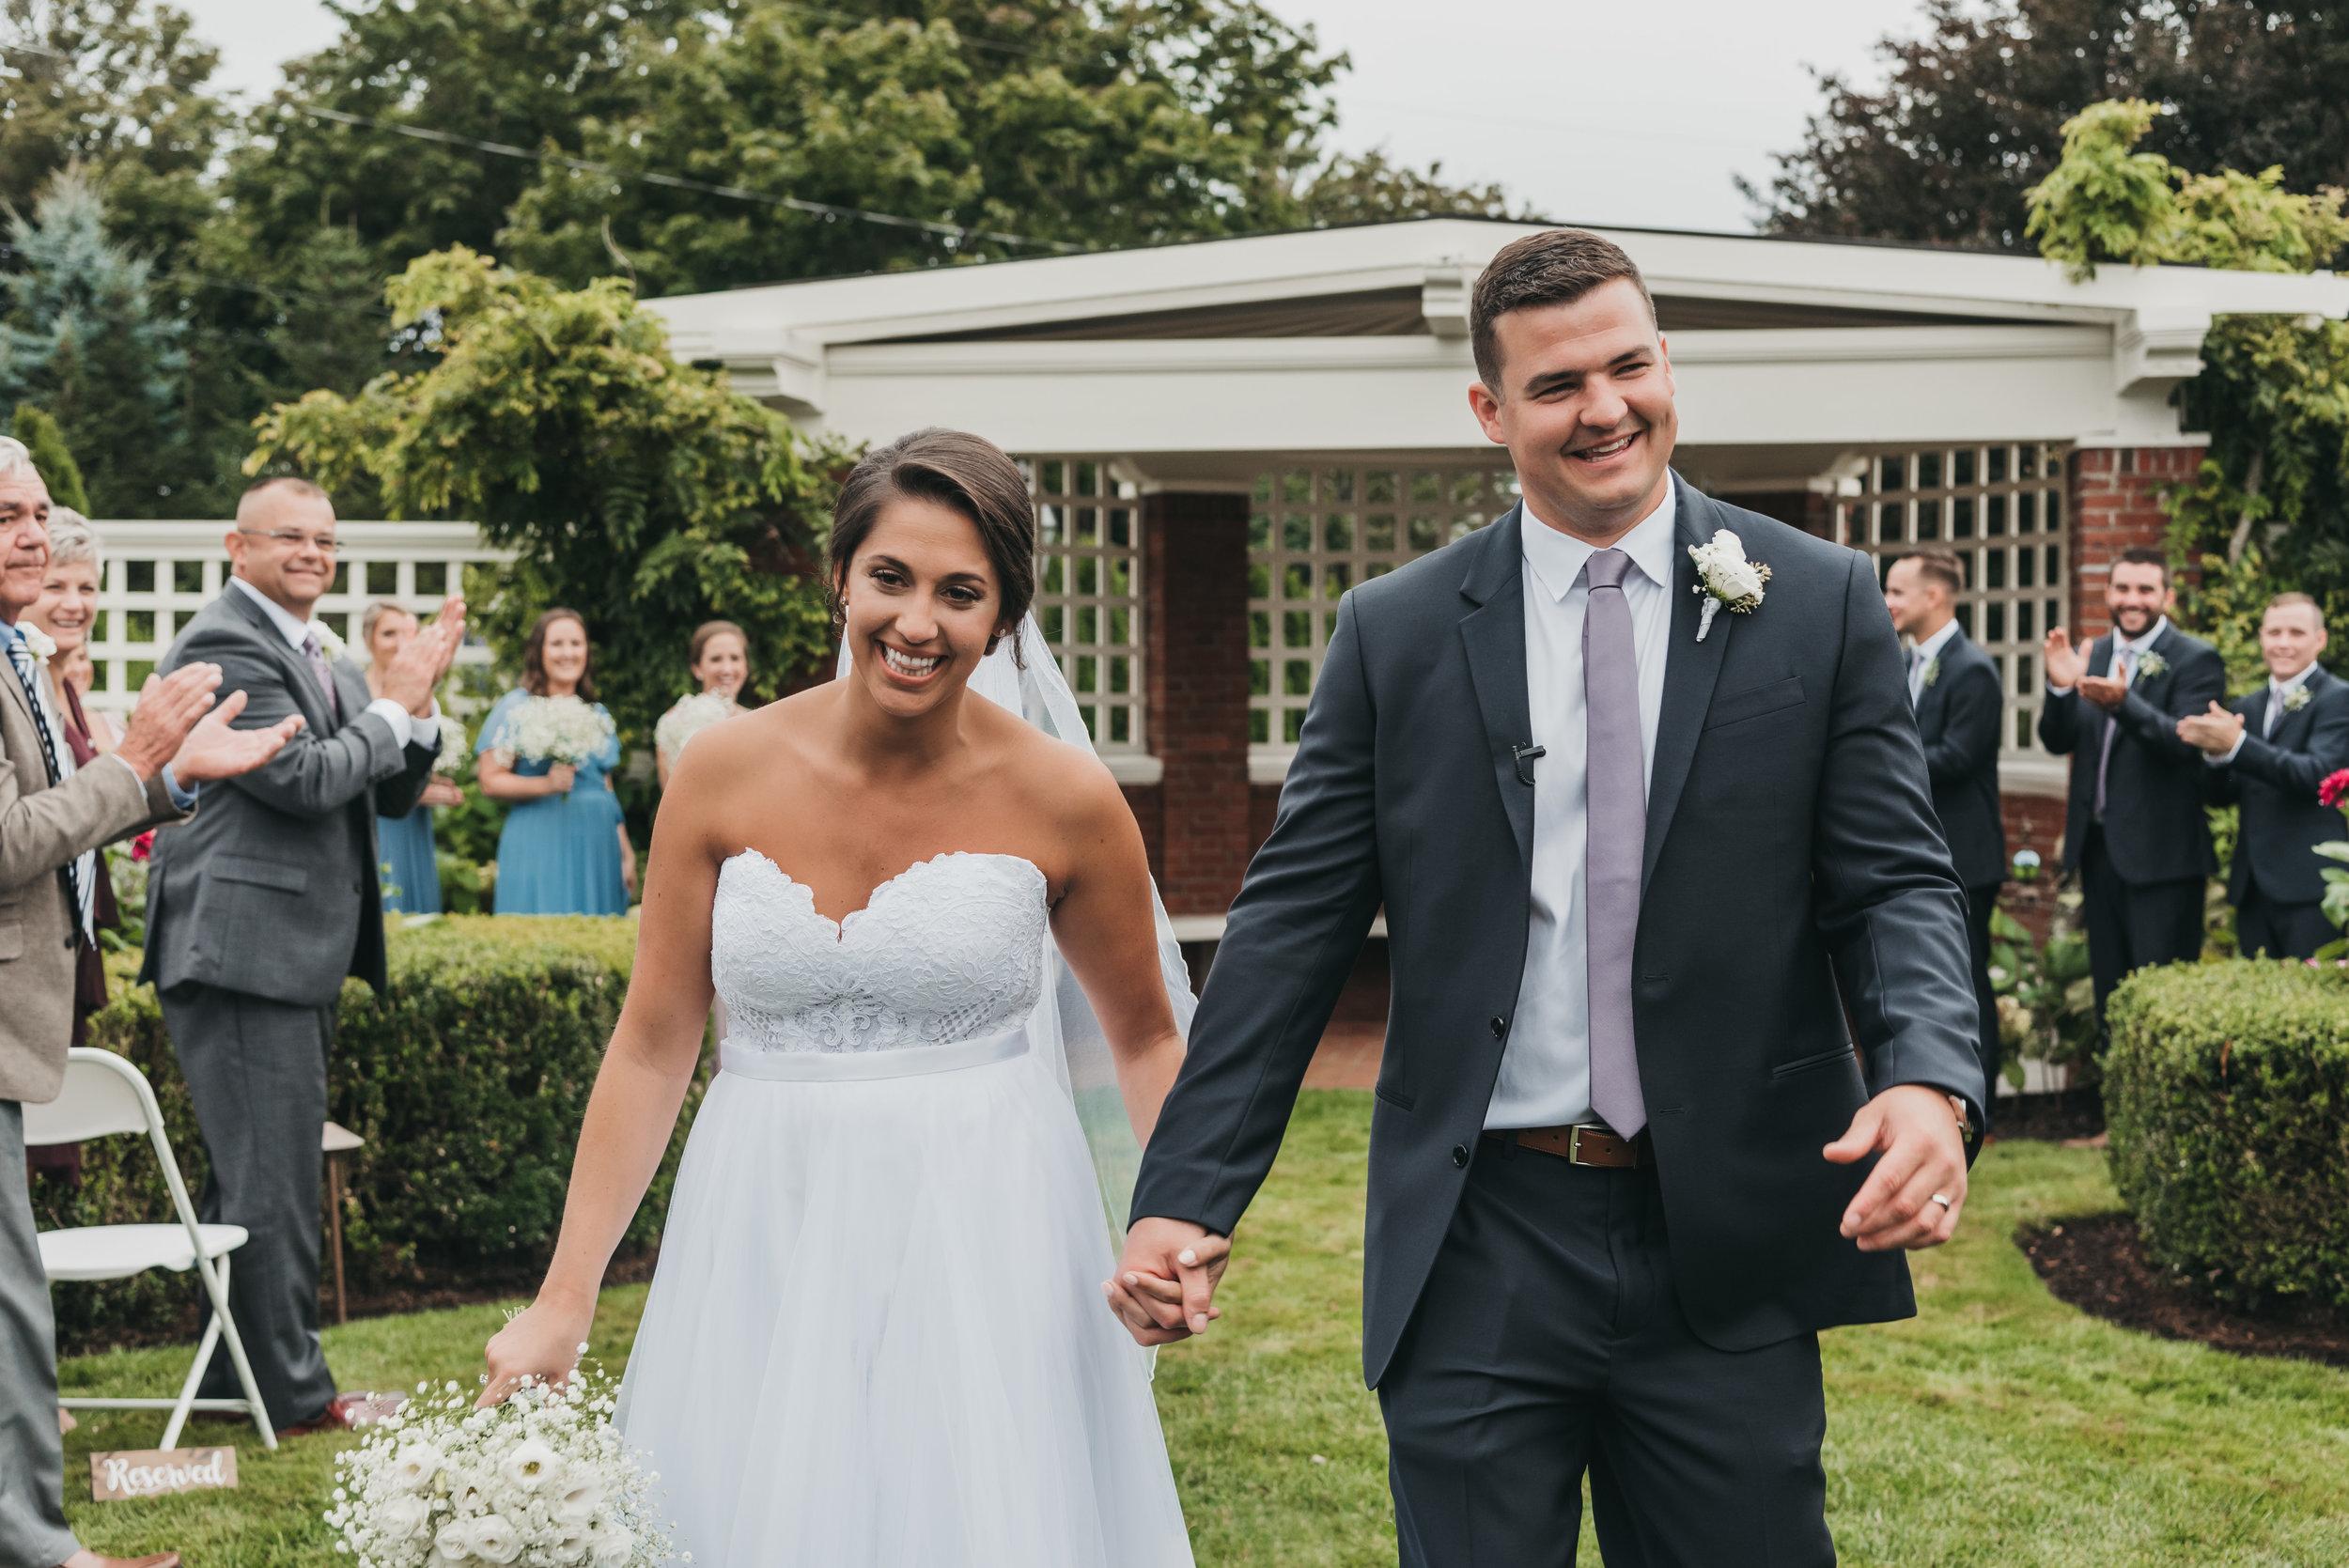 New Hampshire beachside wedding